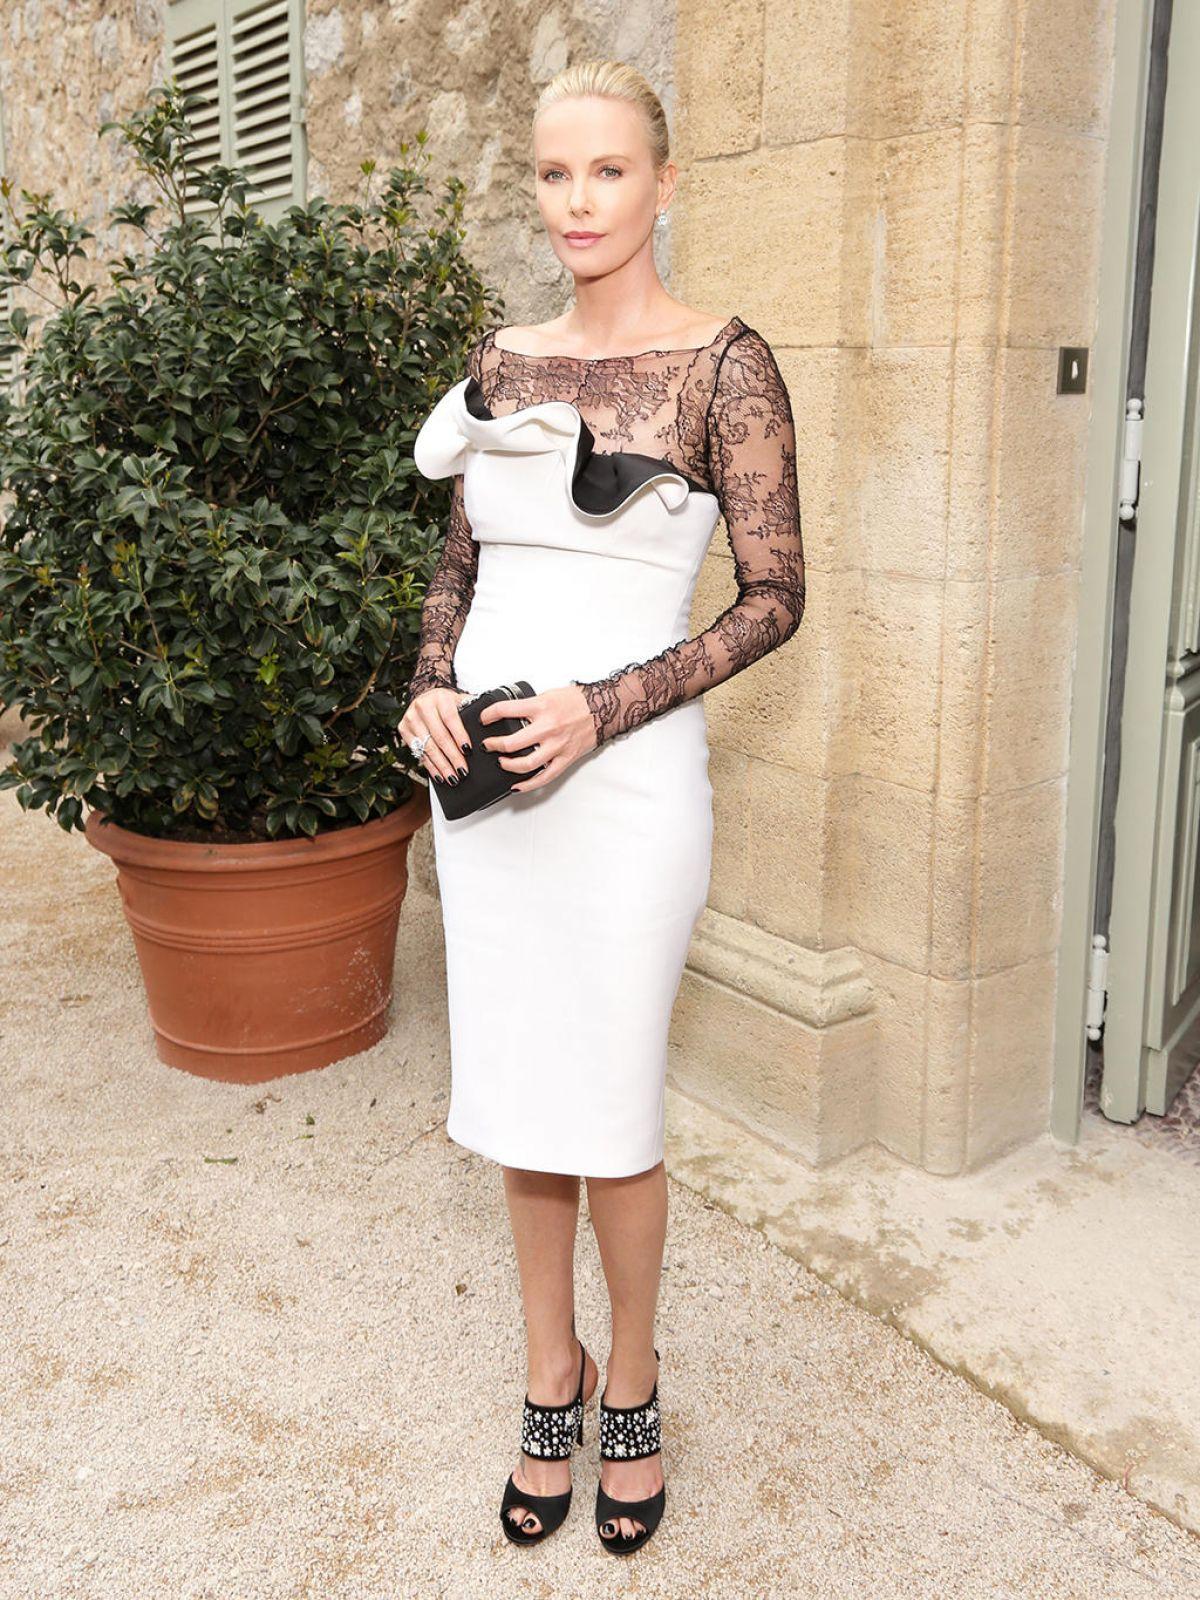 CHARLIZE THERON at Christian Dior